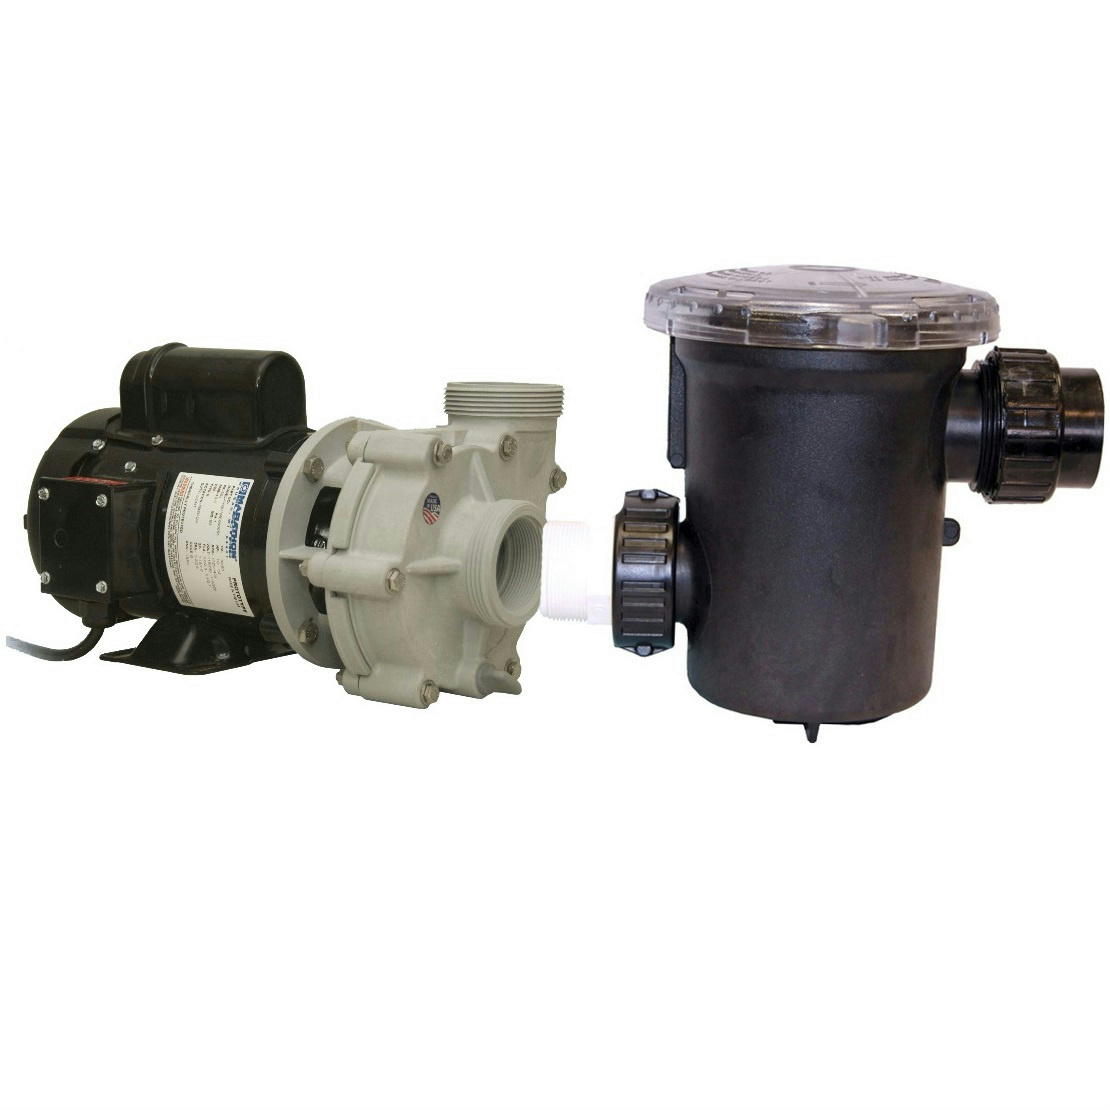 Sequence 3600seq20 external pond pump 4000 series plus 6 for External pond pumps